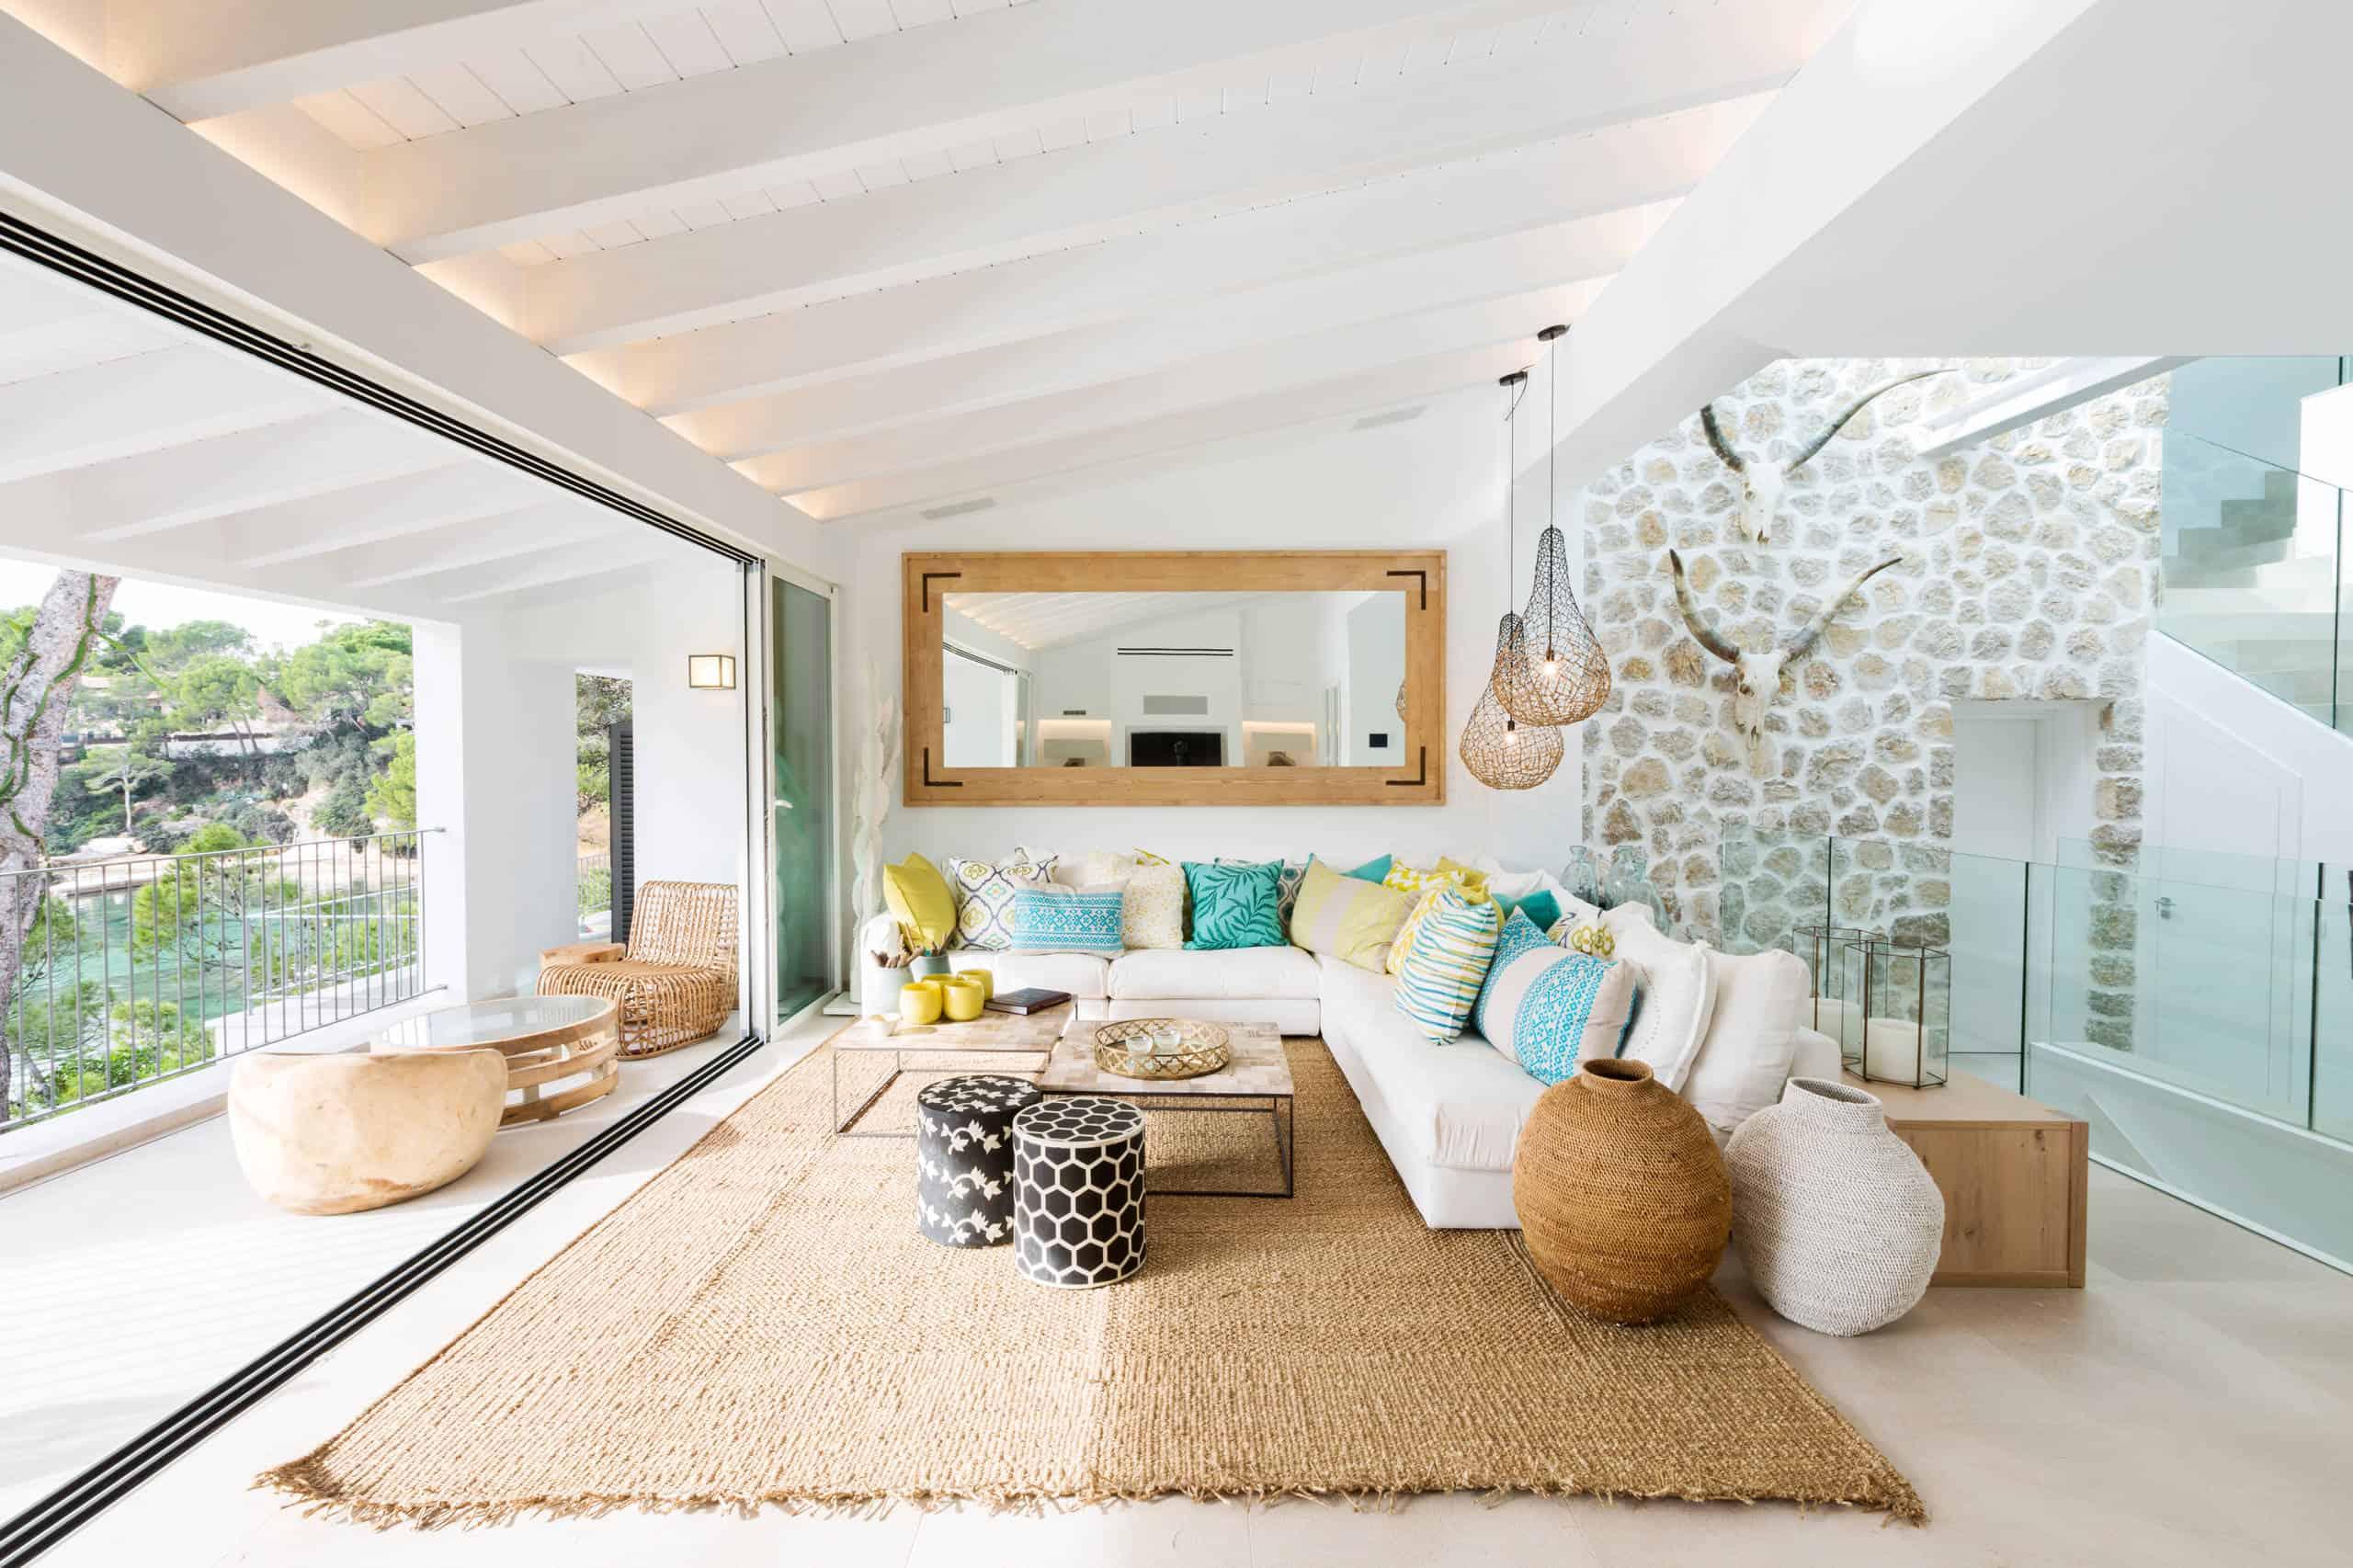 spanish home decor ideas muy bueno - Spanish Decor